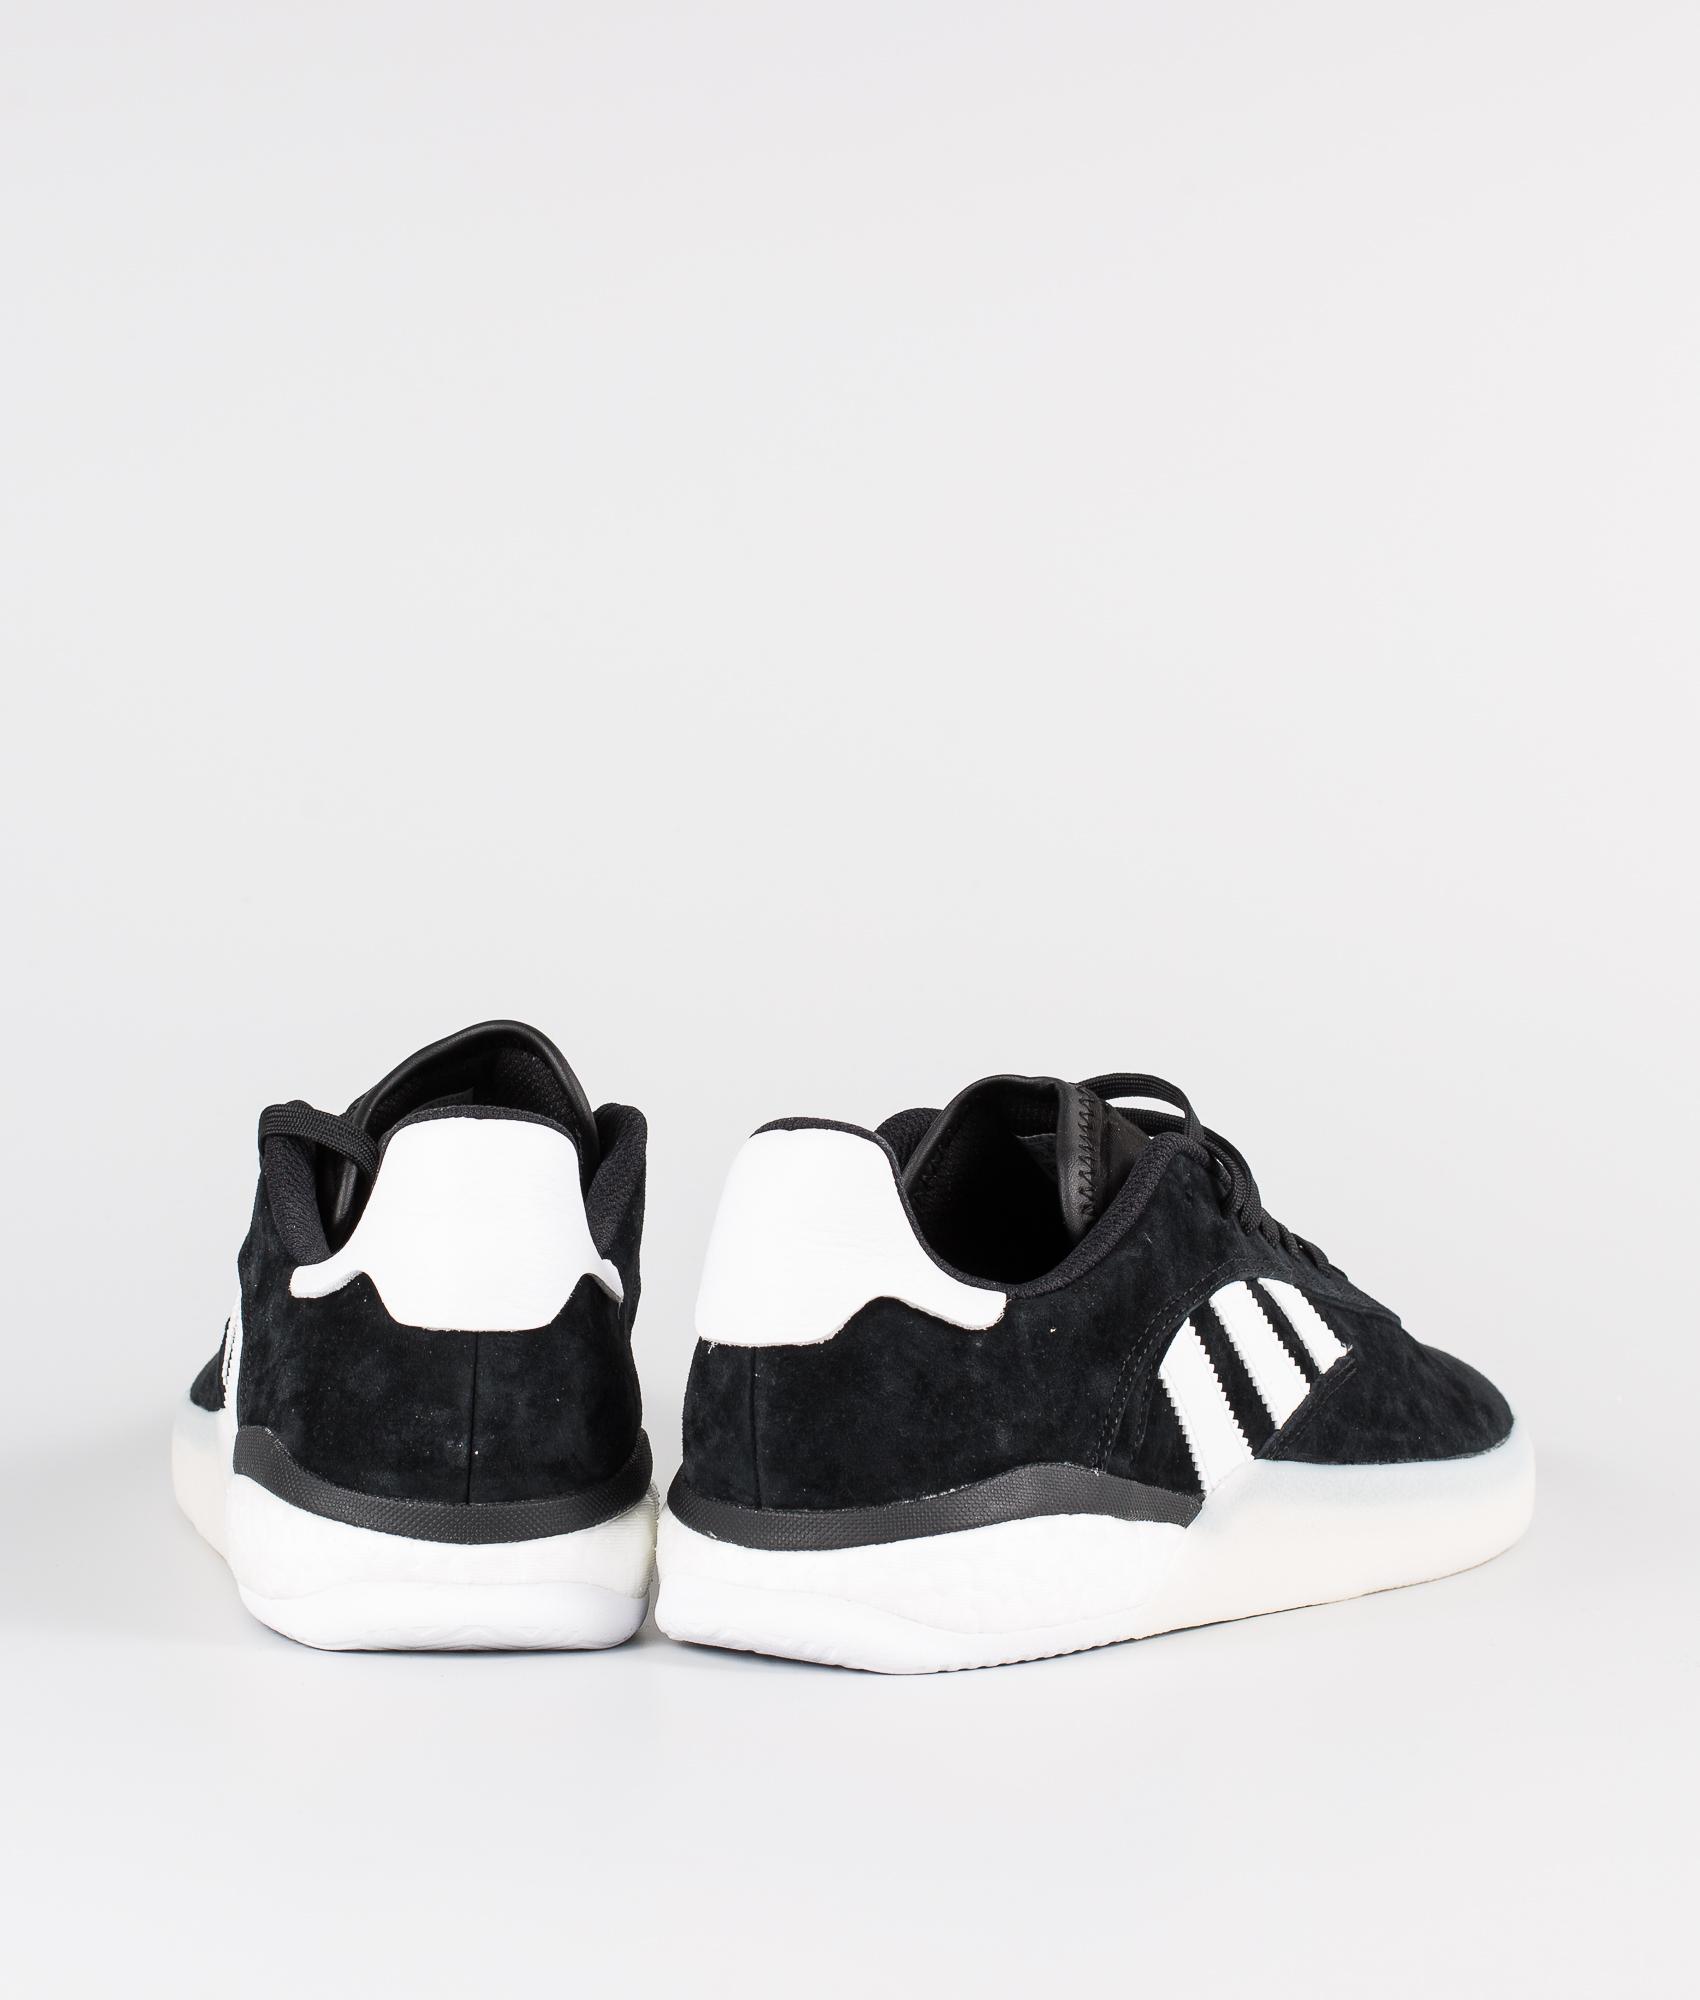 Adidas Skateboarding 3St.004 Shoes Core BlackFtwr WhiteCore Black